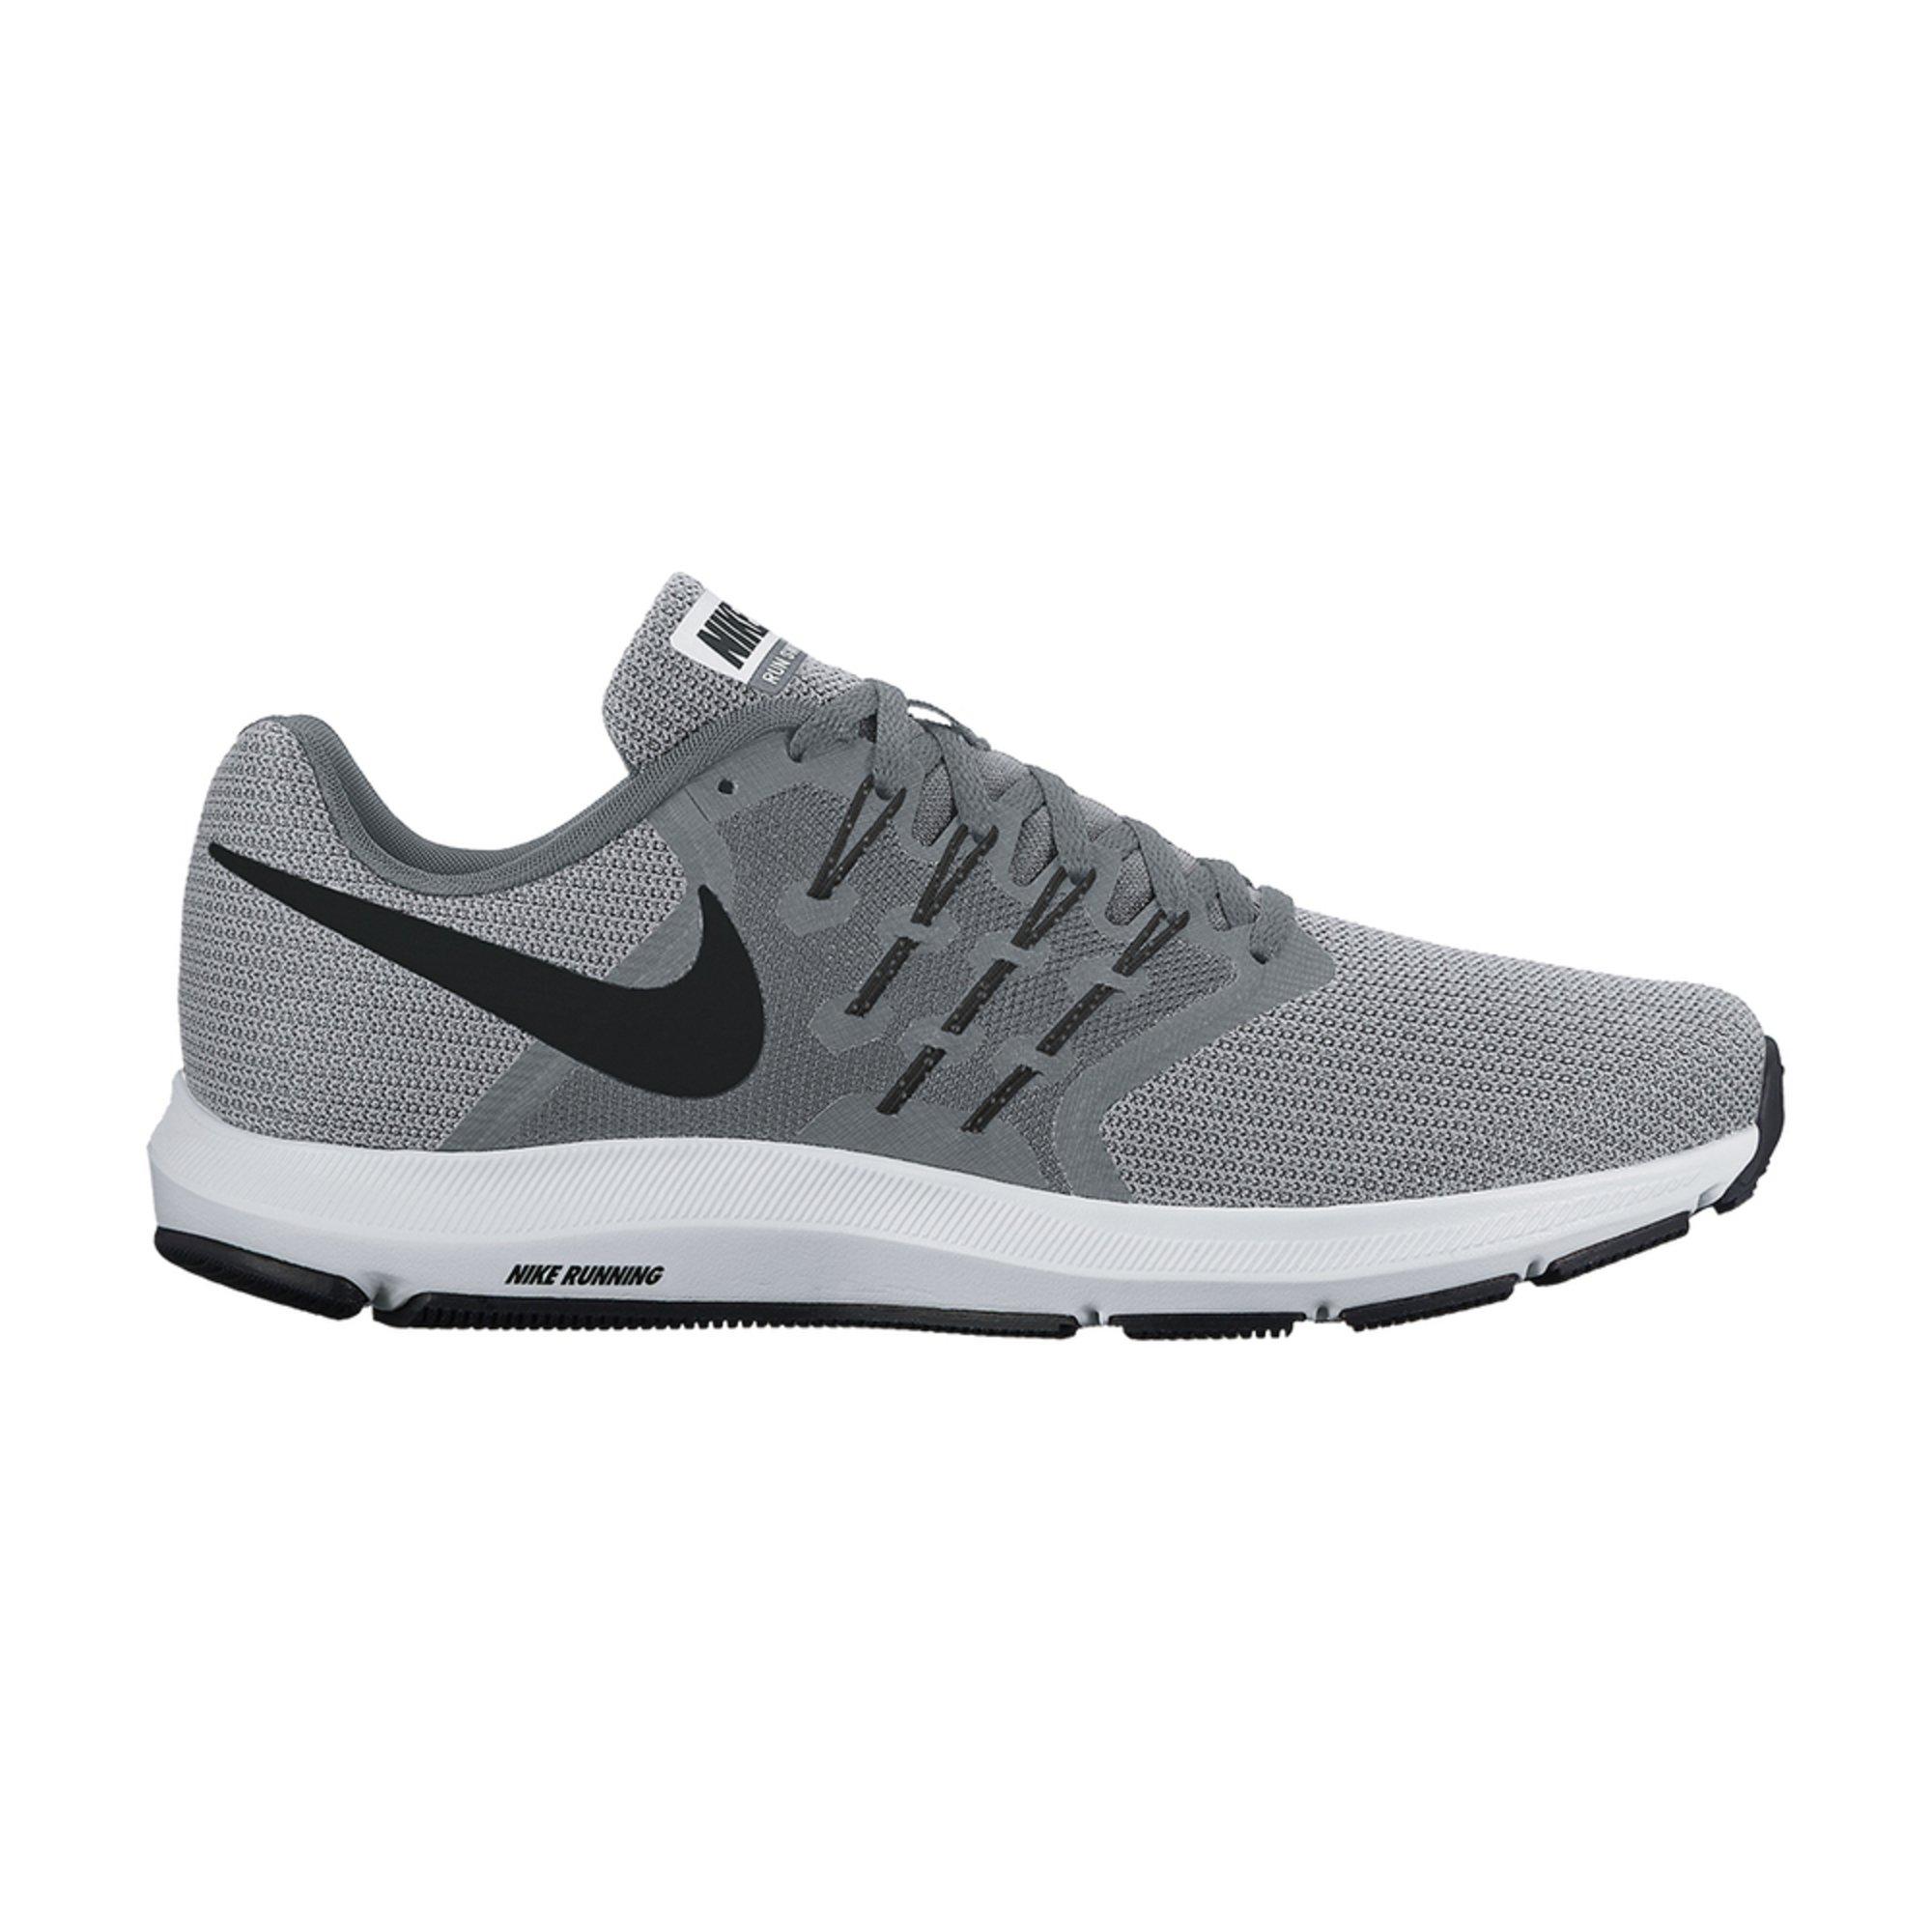 Real Nike Air Max  Men Running Roshe Run Shoes